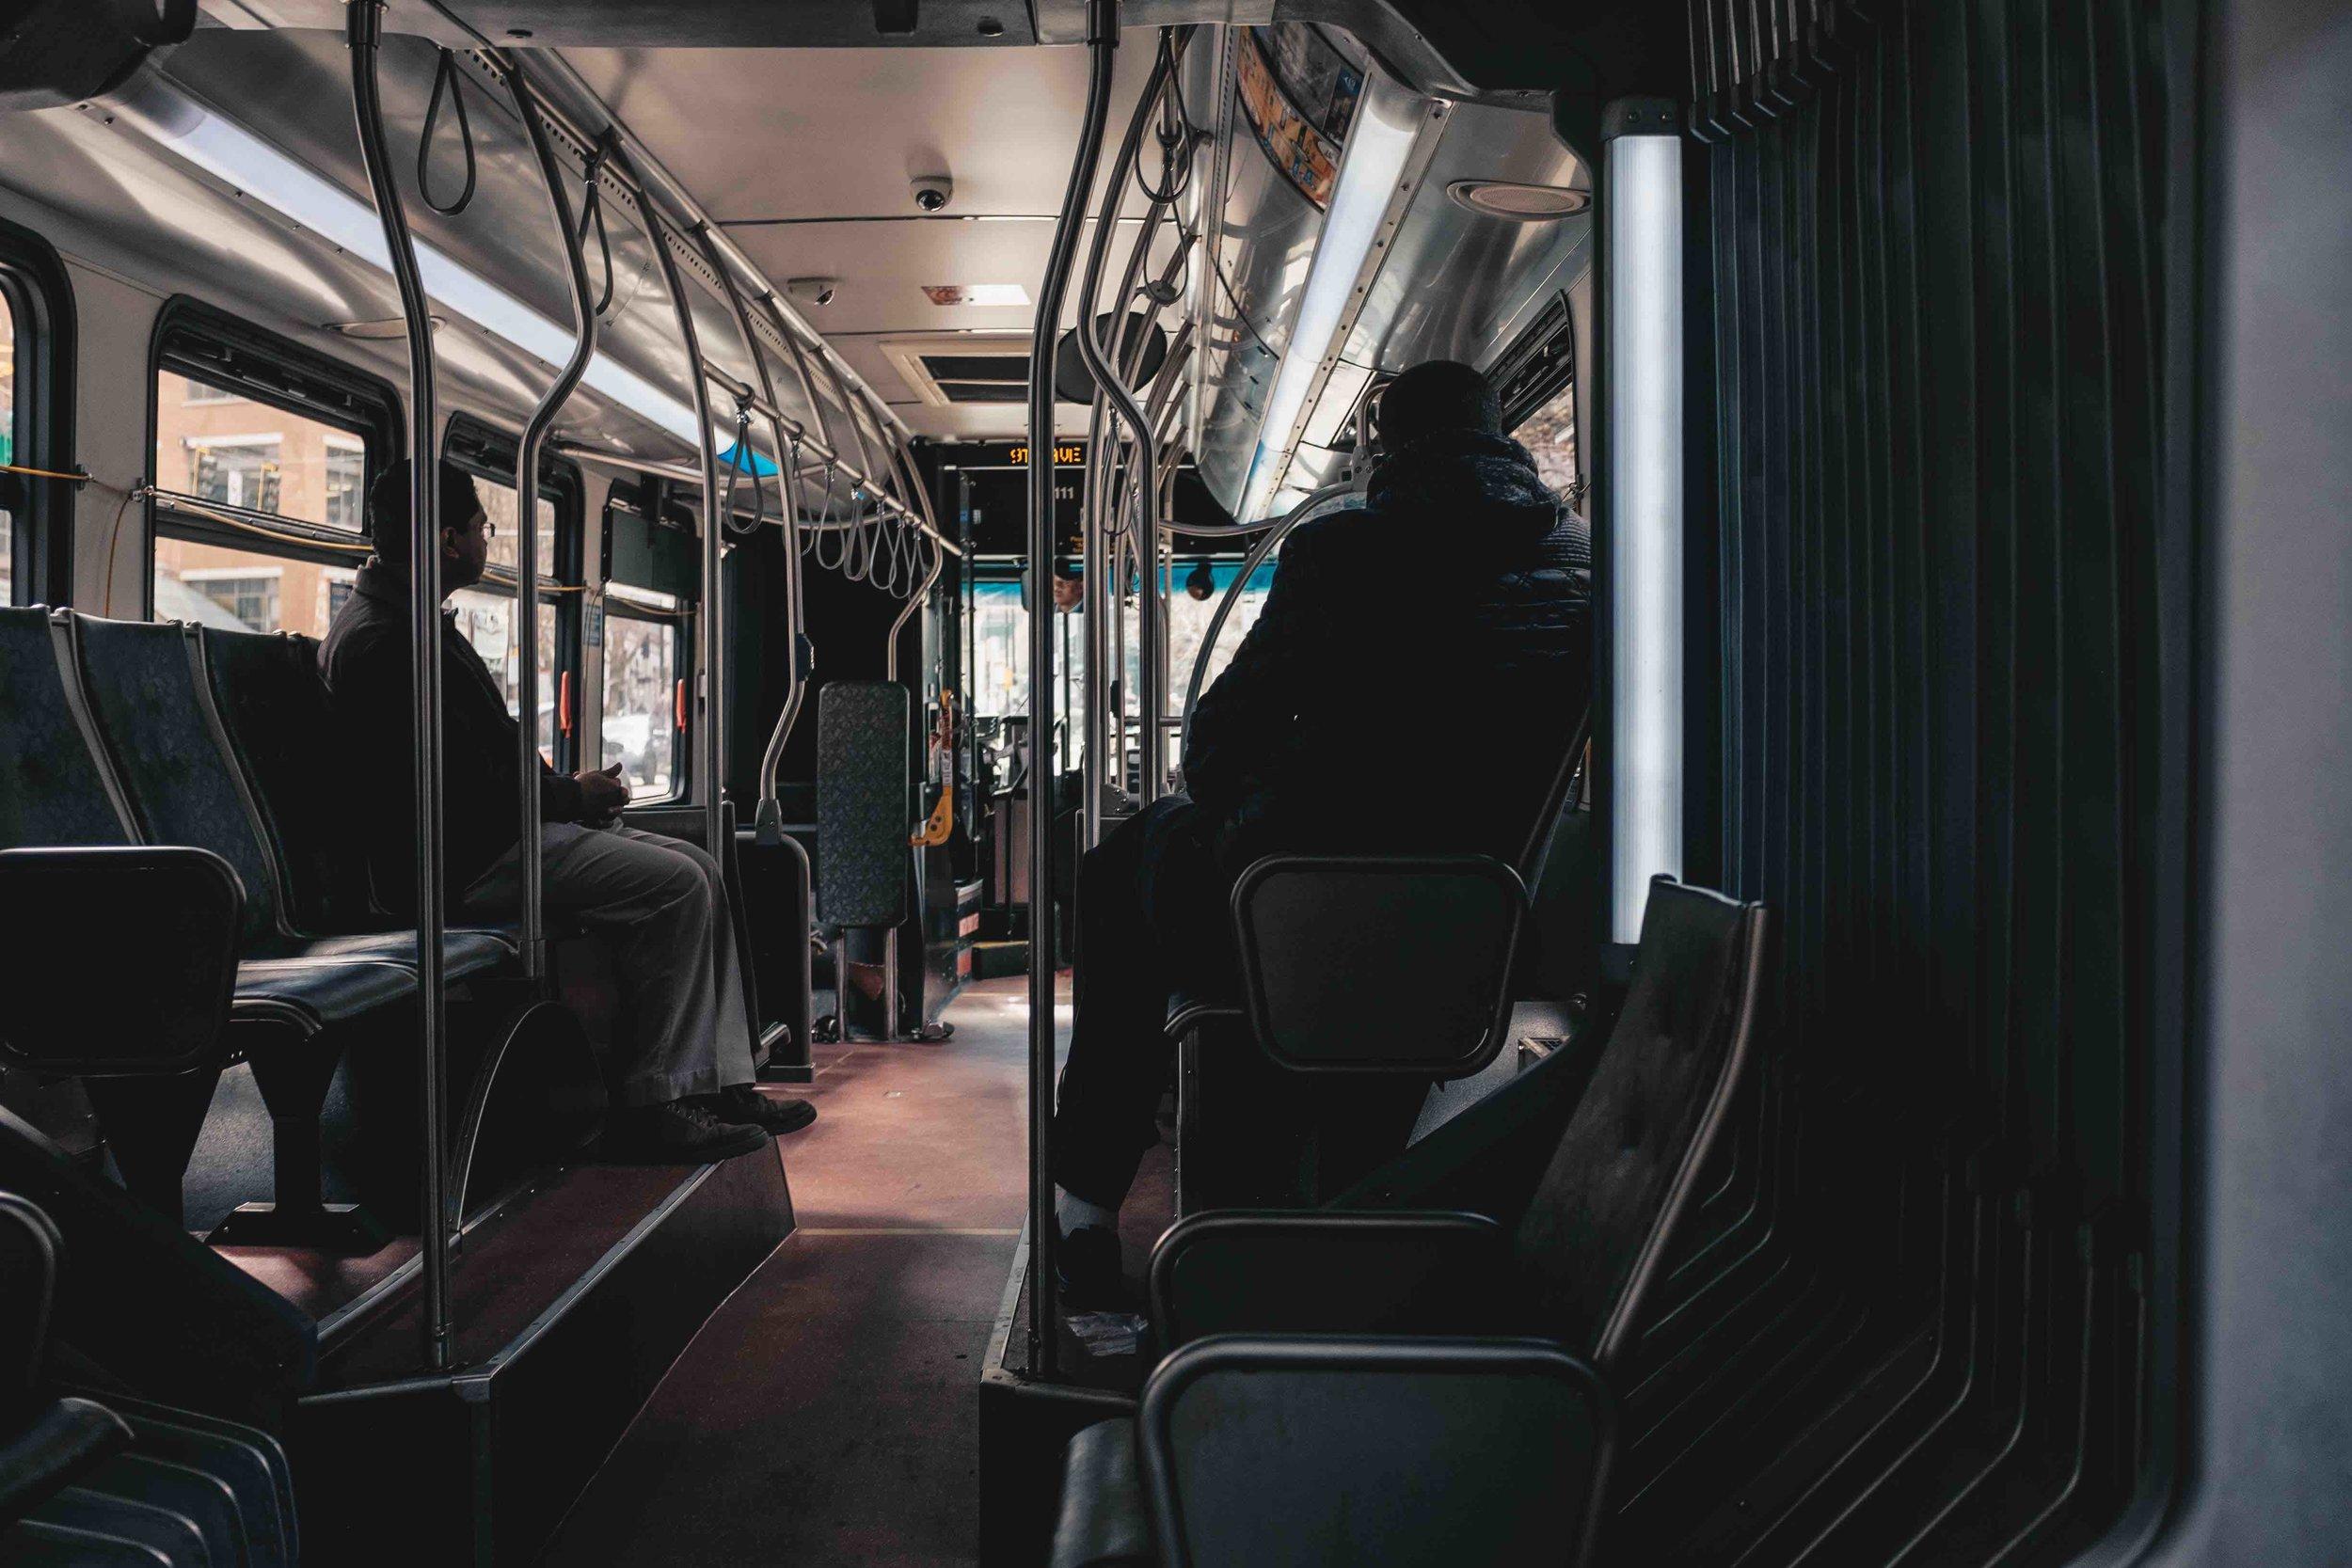 Seattle's super into cashless public transit too!